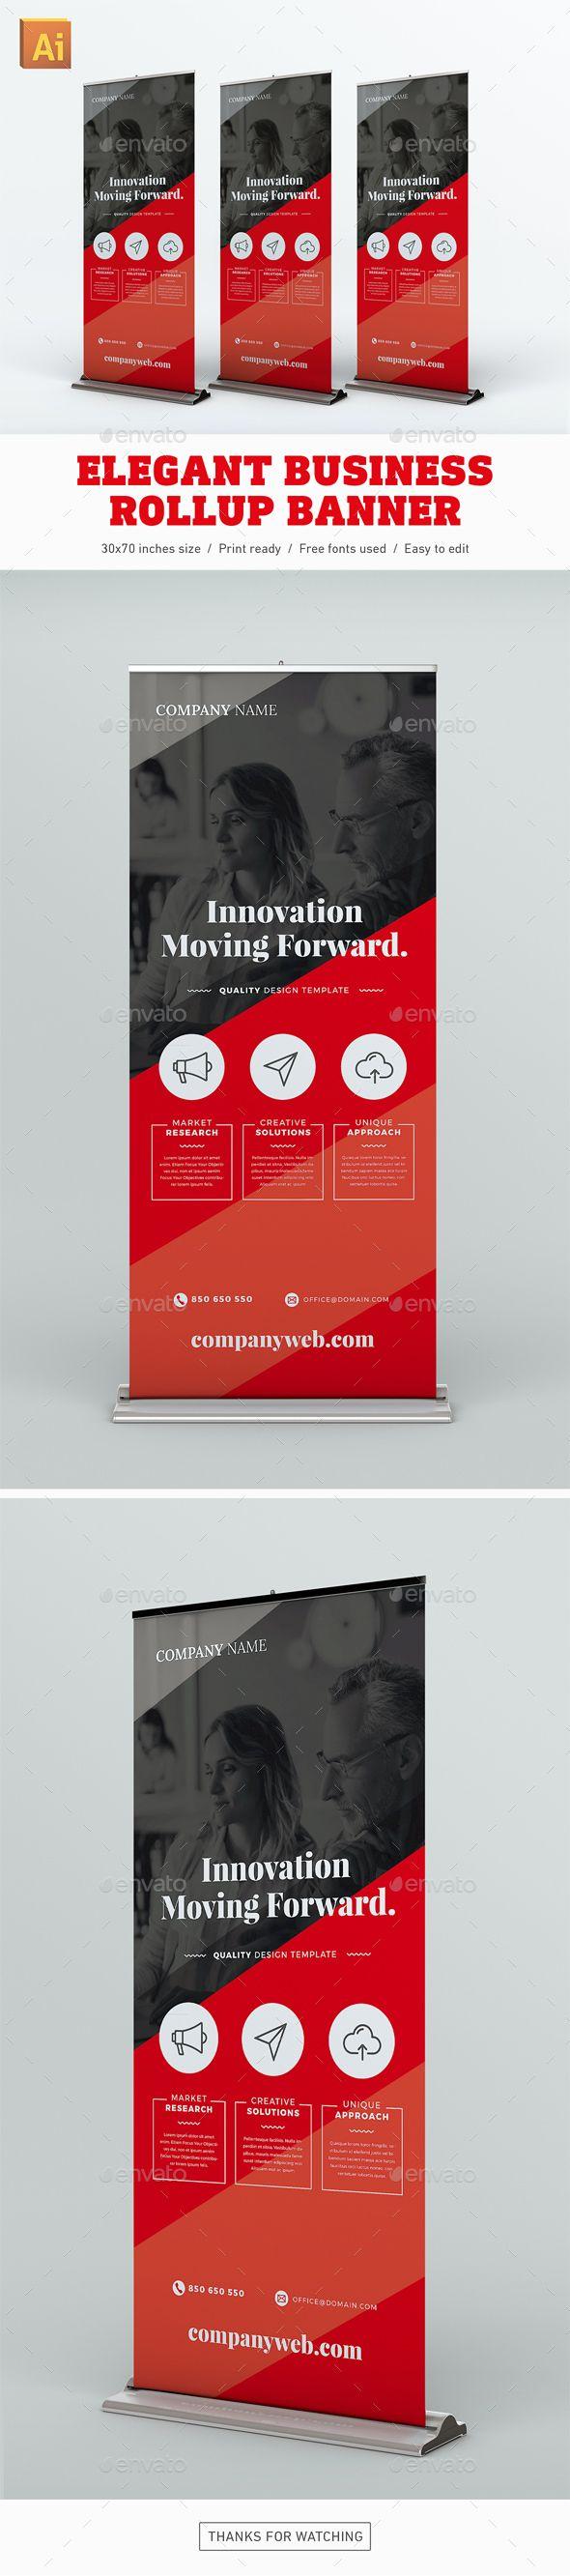 Design banner minimalist - Elegant Business Rollup Banner